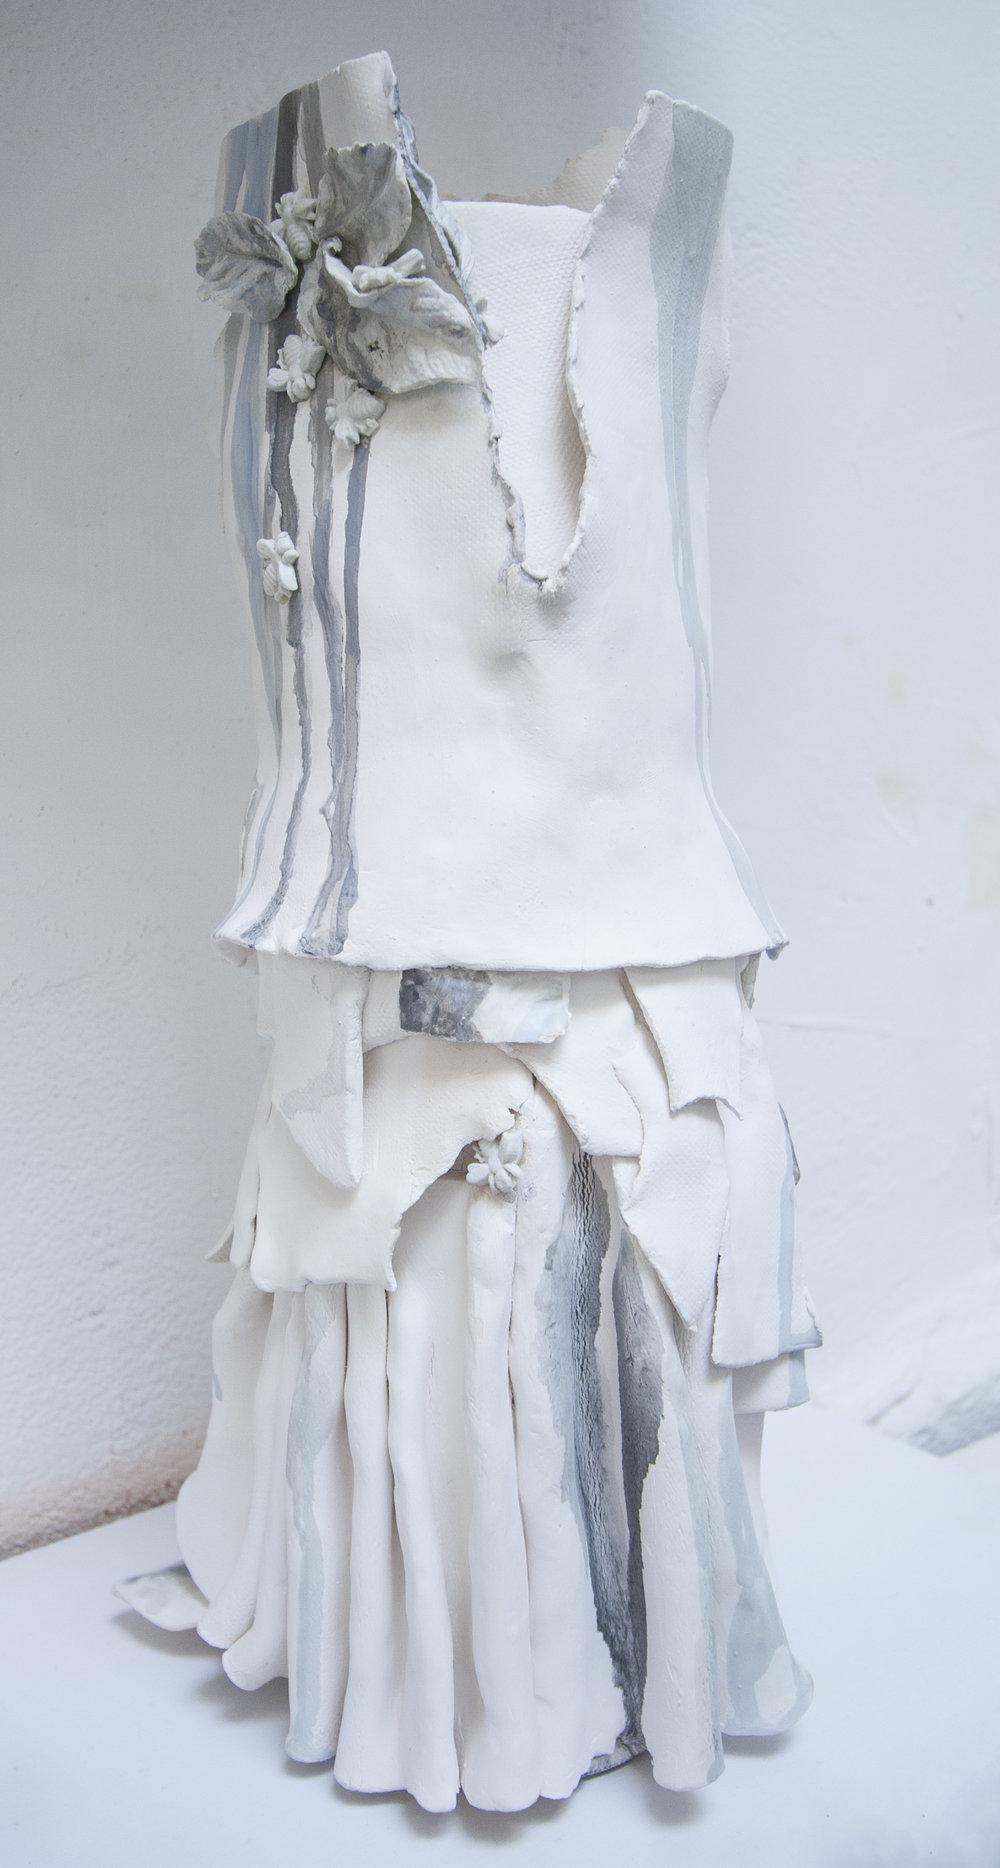 Acropolic Maiden